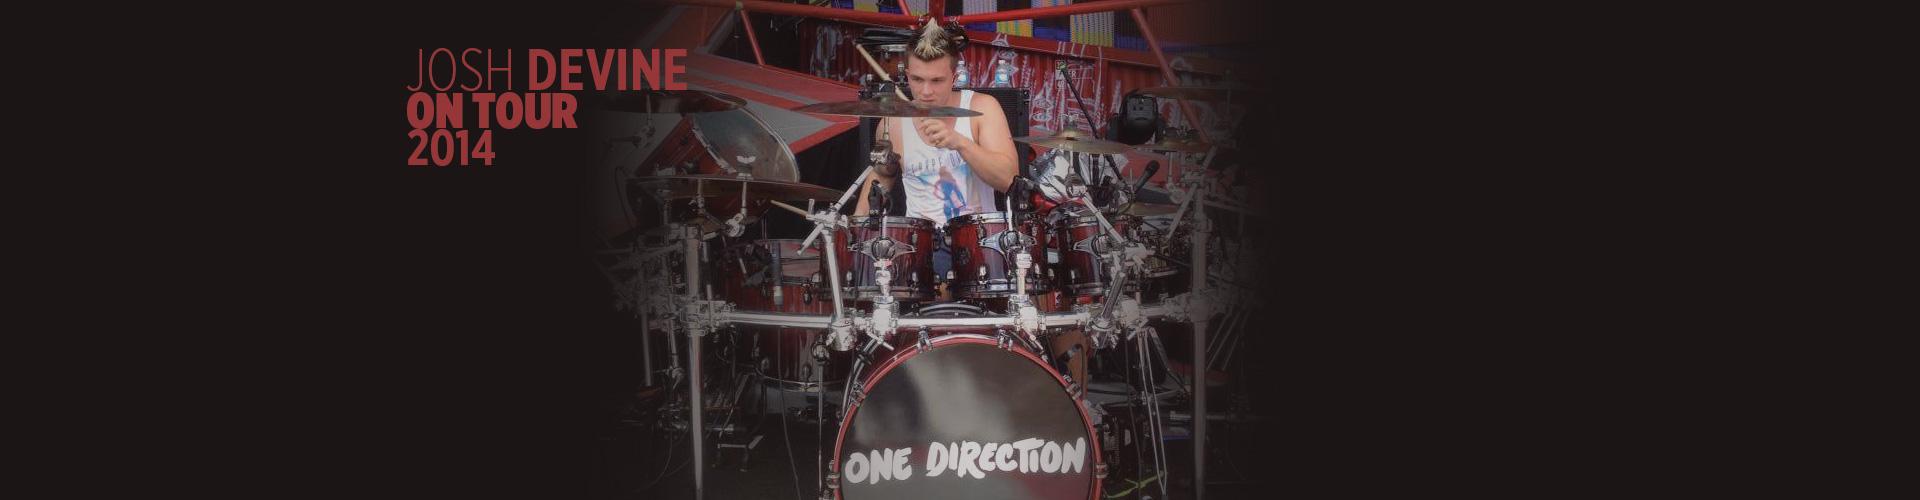 Josh Devine Tour